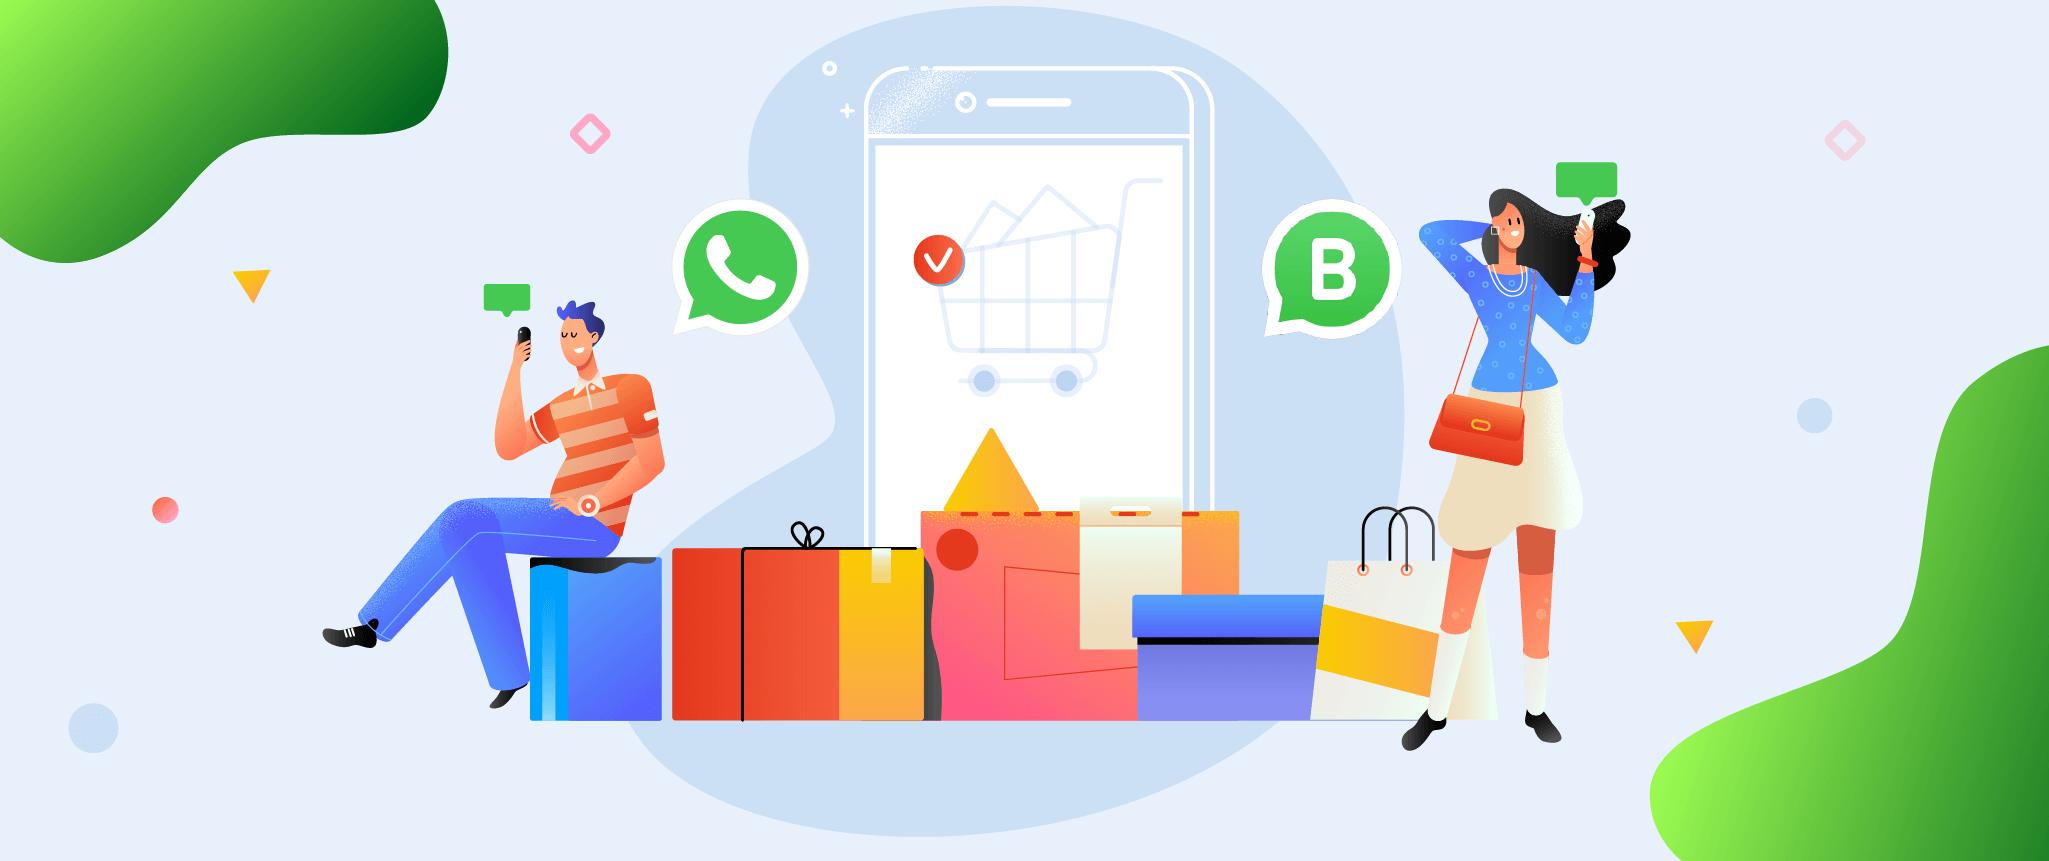 Marketing through WhatsApp Business: Achieve Customer Delight in the Digital Era